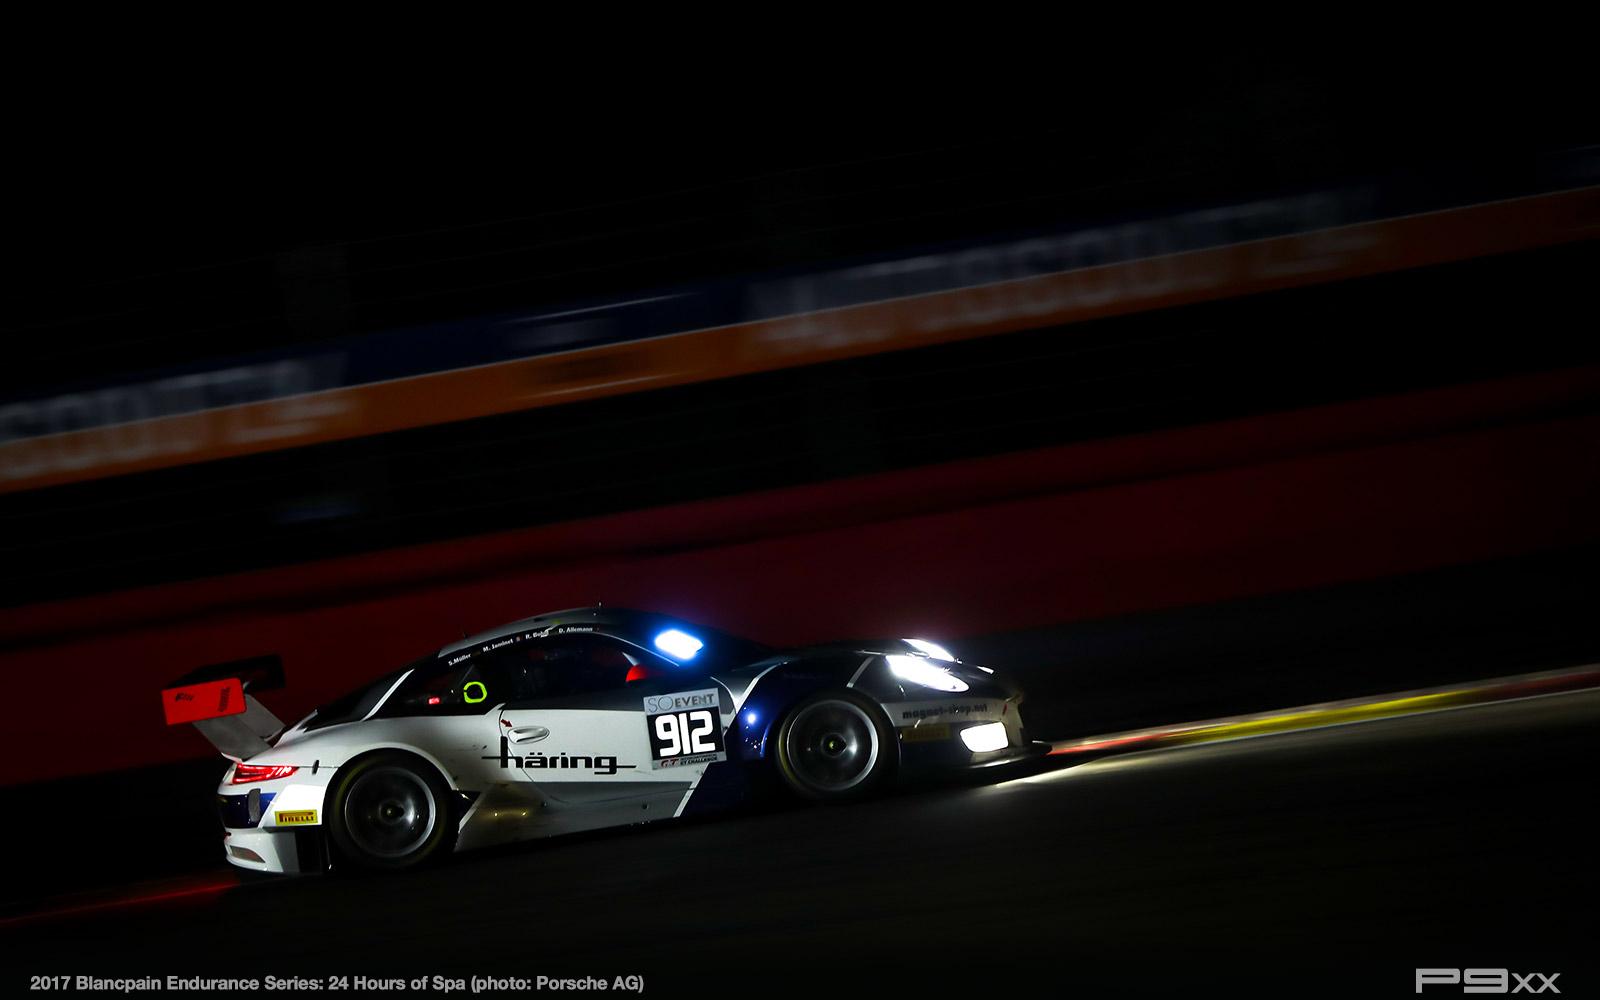 2017-24-Hours-of-Spa-Porsche-326